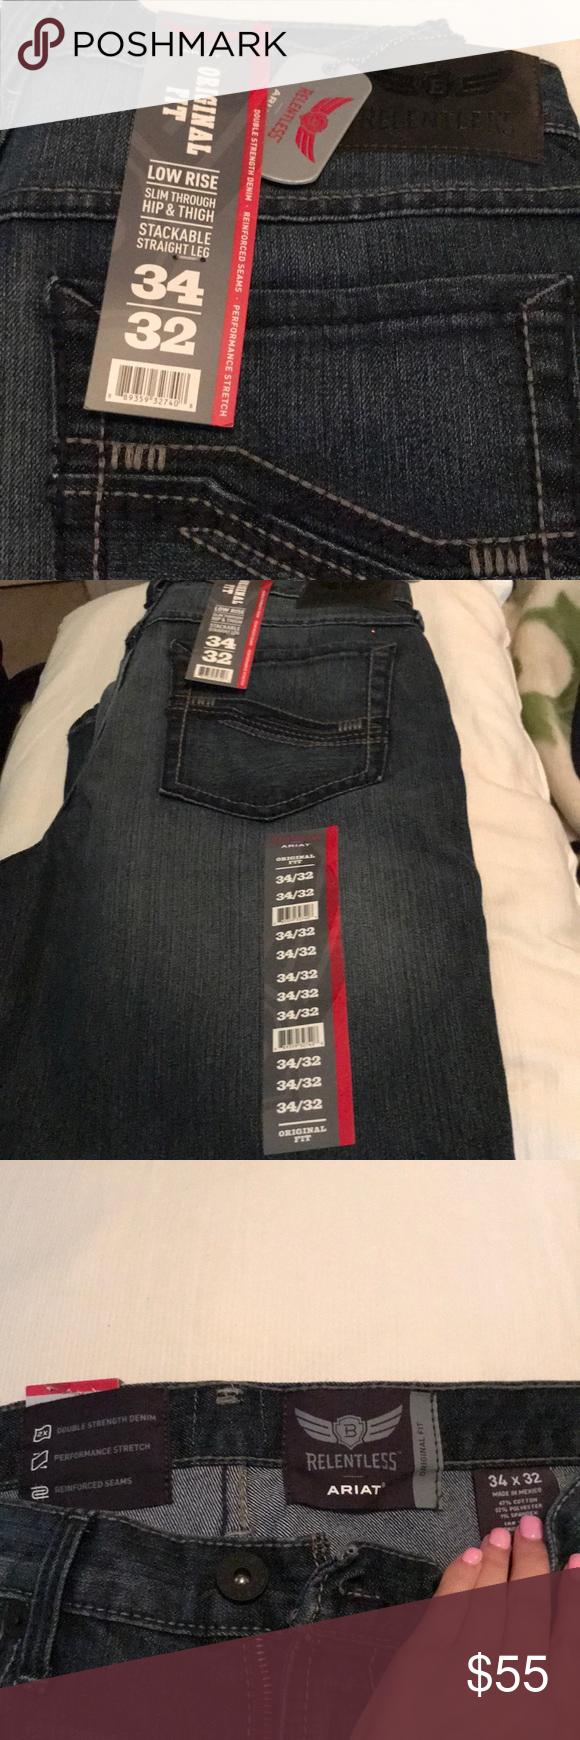 f1a065eef0d Ariat men's relentless jeans NWT sz 34*32 original fit Ariat Jeans ...